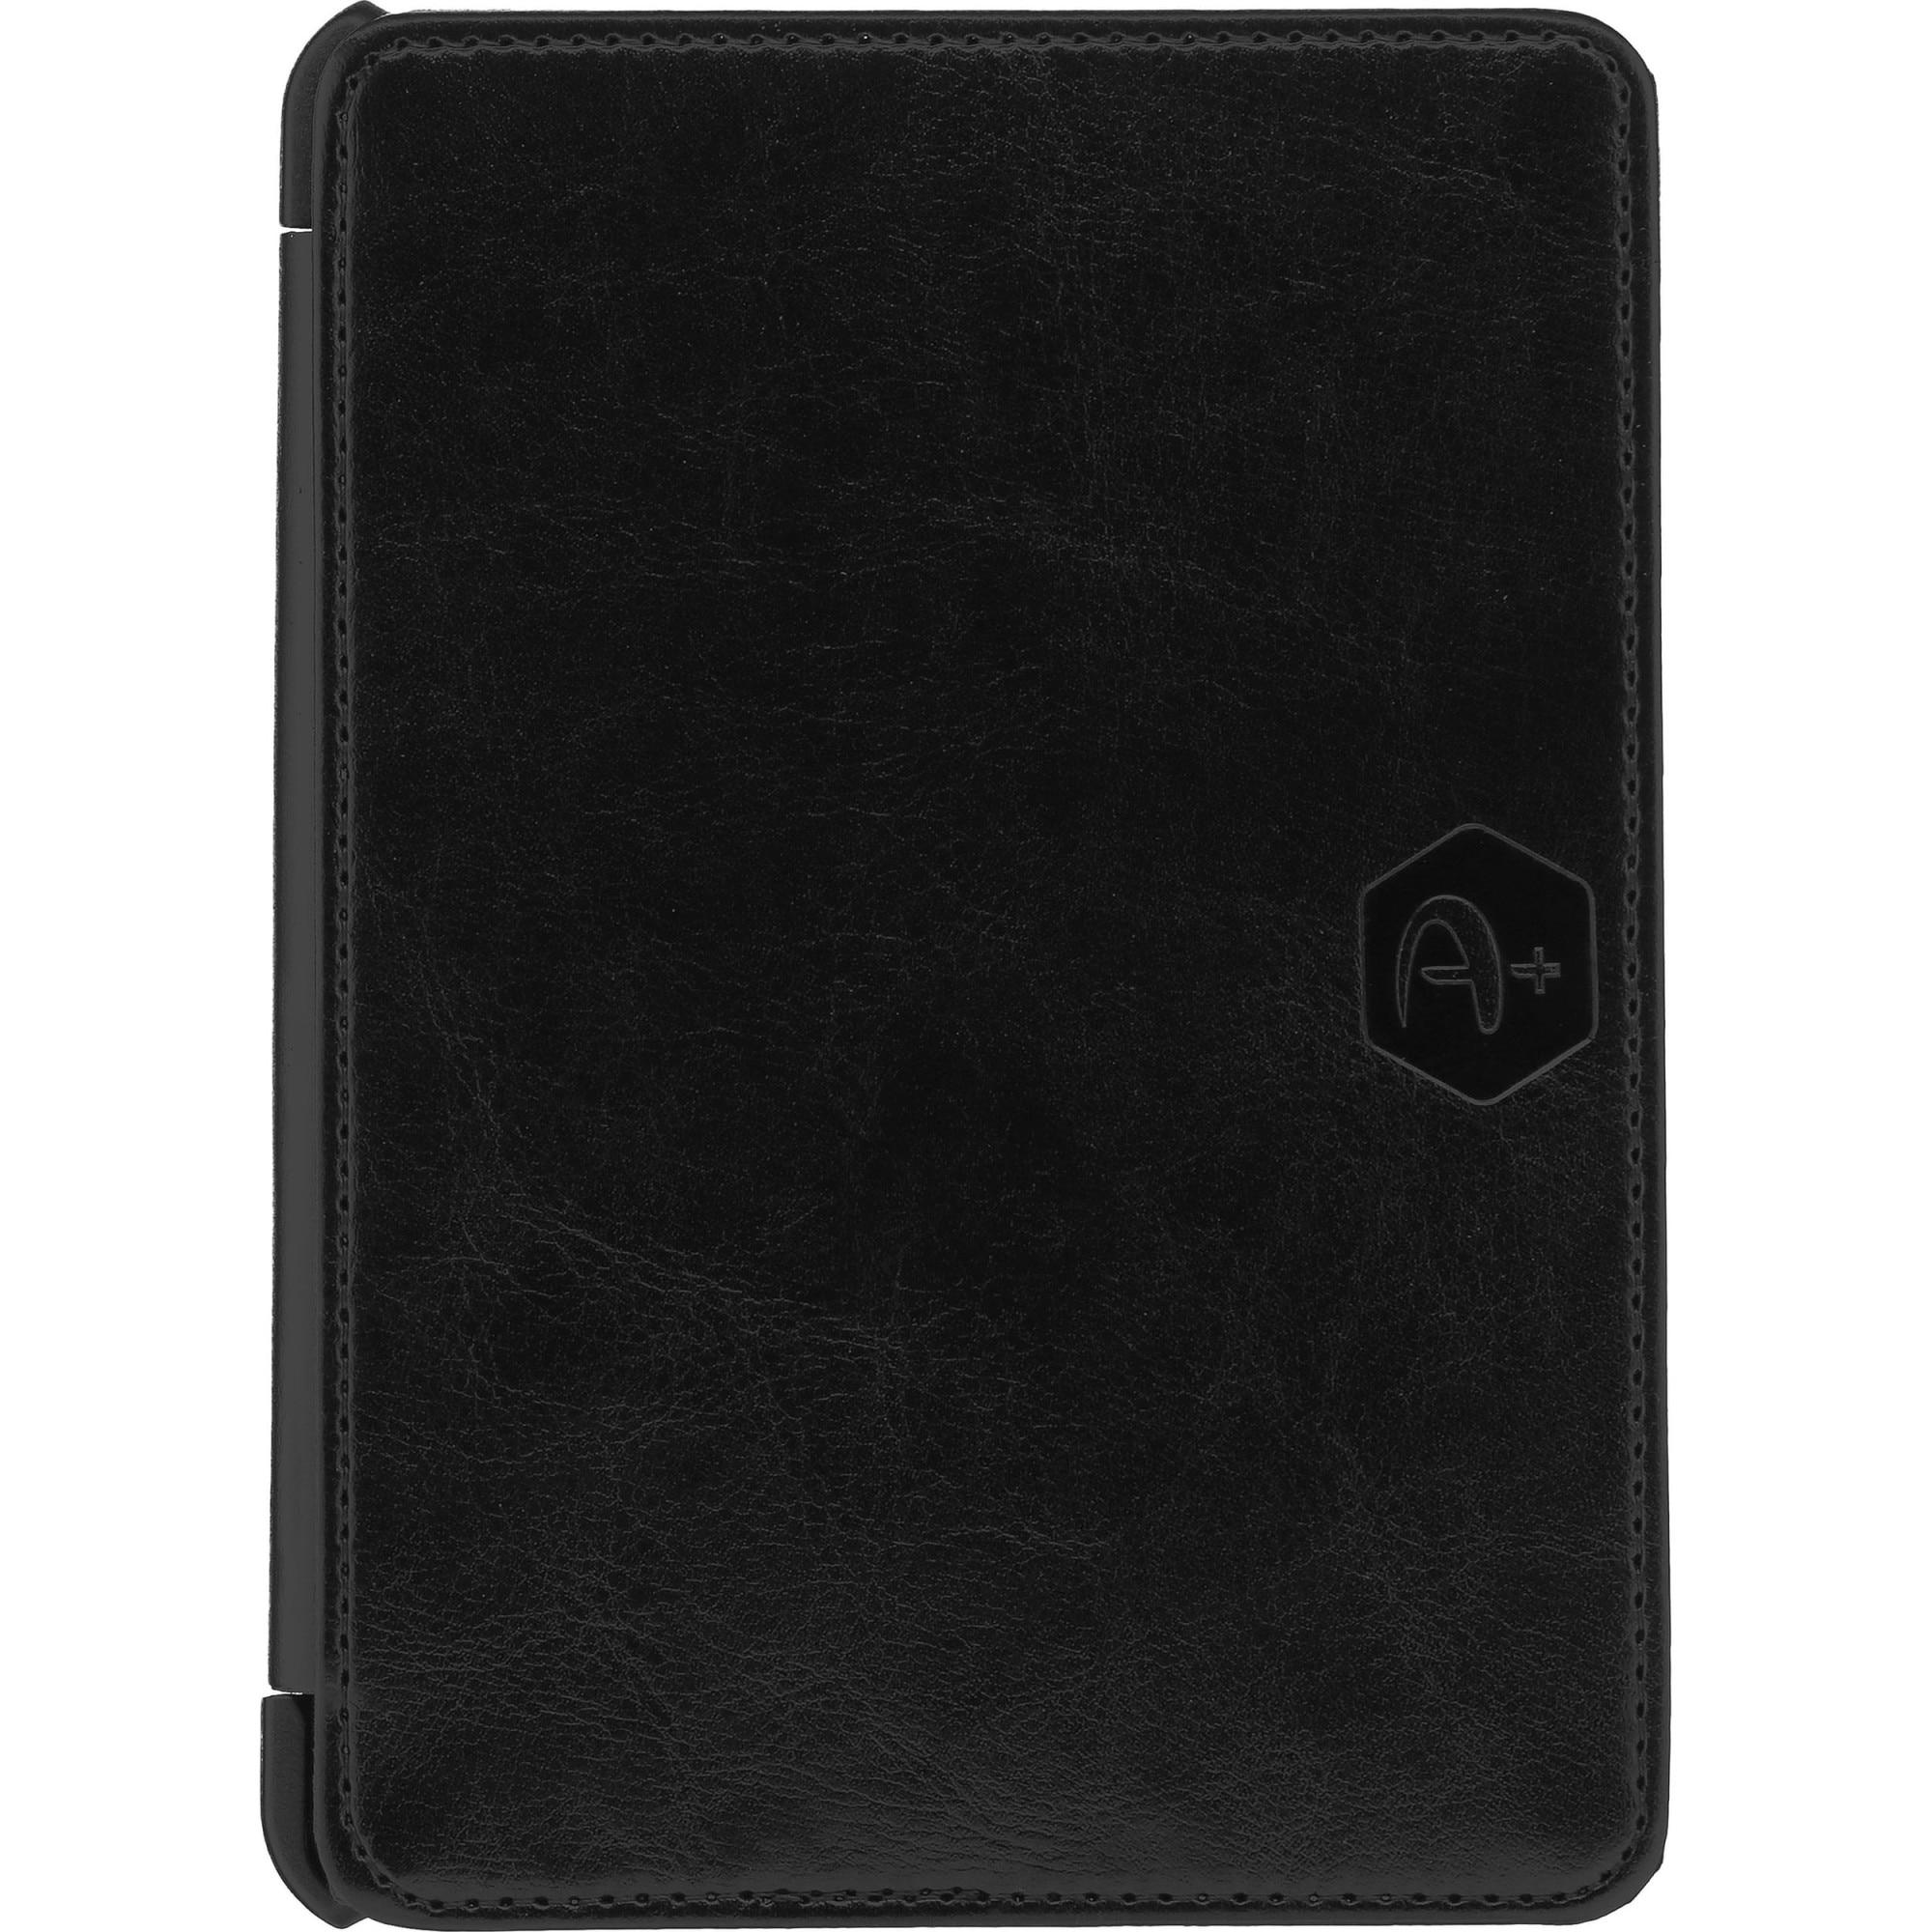 Fotografie Husa de protectie A+ Slim pentru Kindle Paperwhite 4 (10th Generation-2018), Hand black